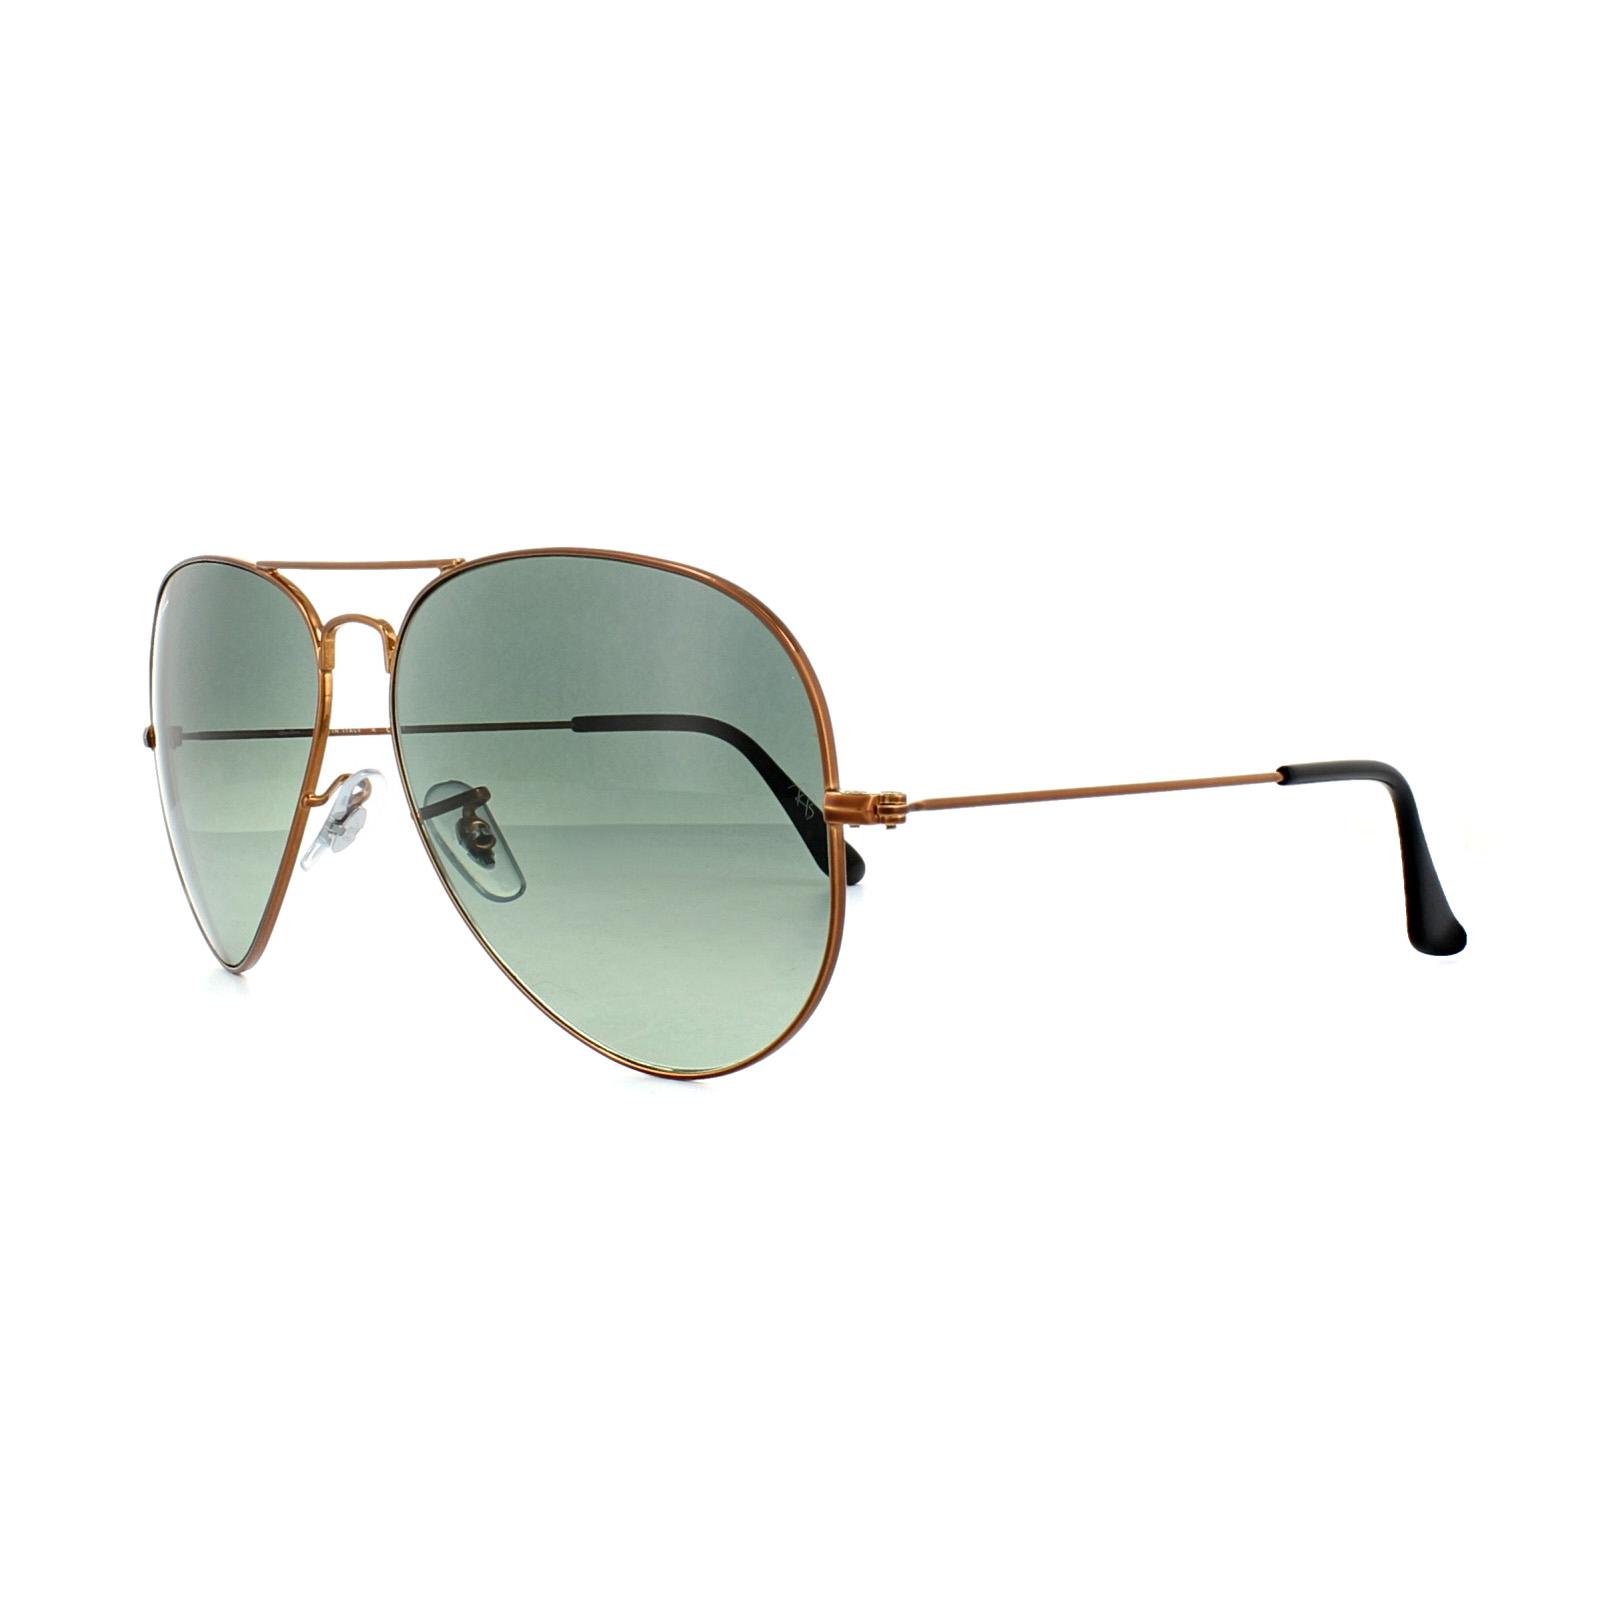 f63f56fbee9 Sentinel Ray-Ban Sunglasses Large Aviator 3026 197 71 Bronze Copper Grey  Gradient. Sentinel Thumbnail 2